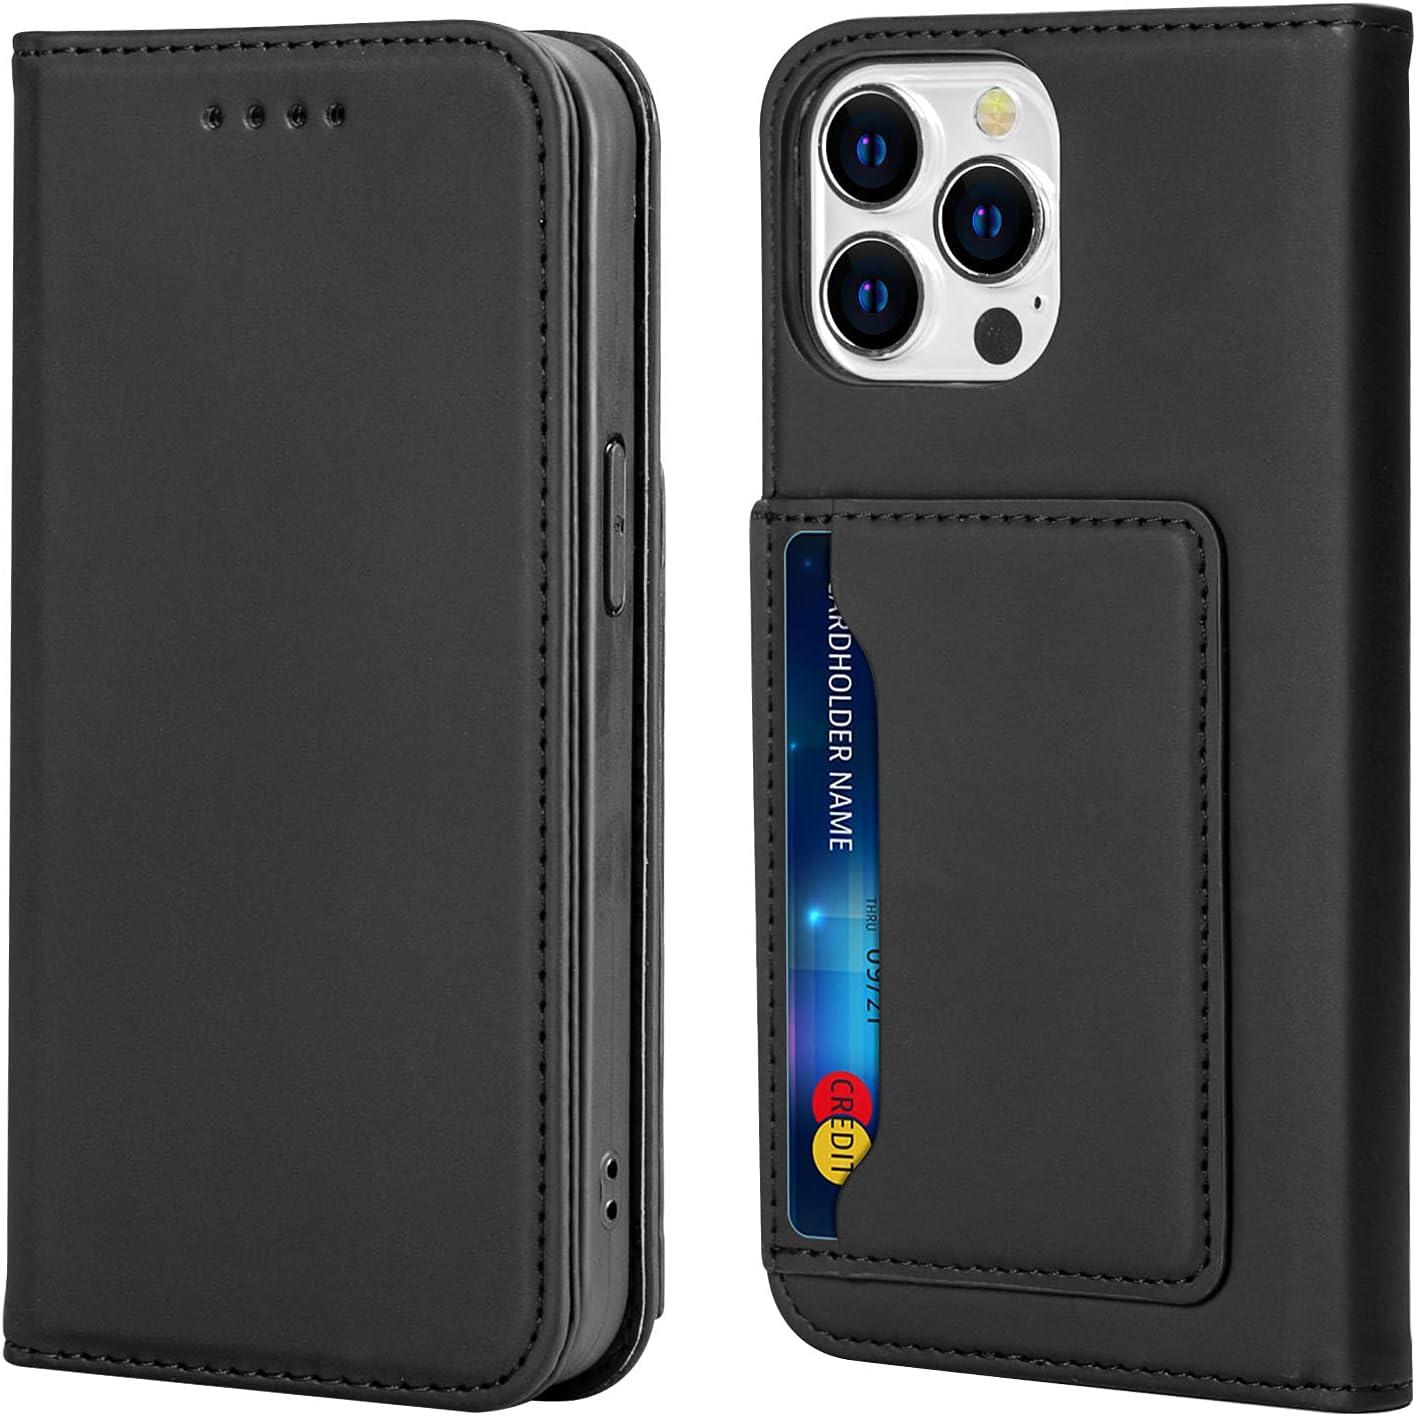 WATACHE Compatible with iPhone 13 Pro Case,Wallet Card Holder Slot Kickstand Slim Fit Premium PU Leather Flip Folio Phone Case Cover for iPhone 13 Pro (Black)